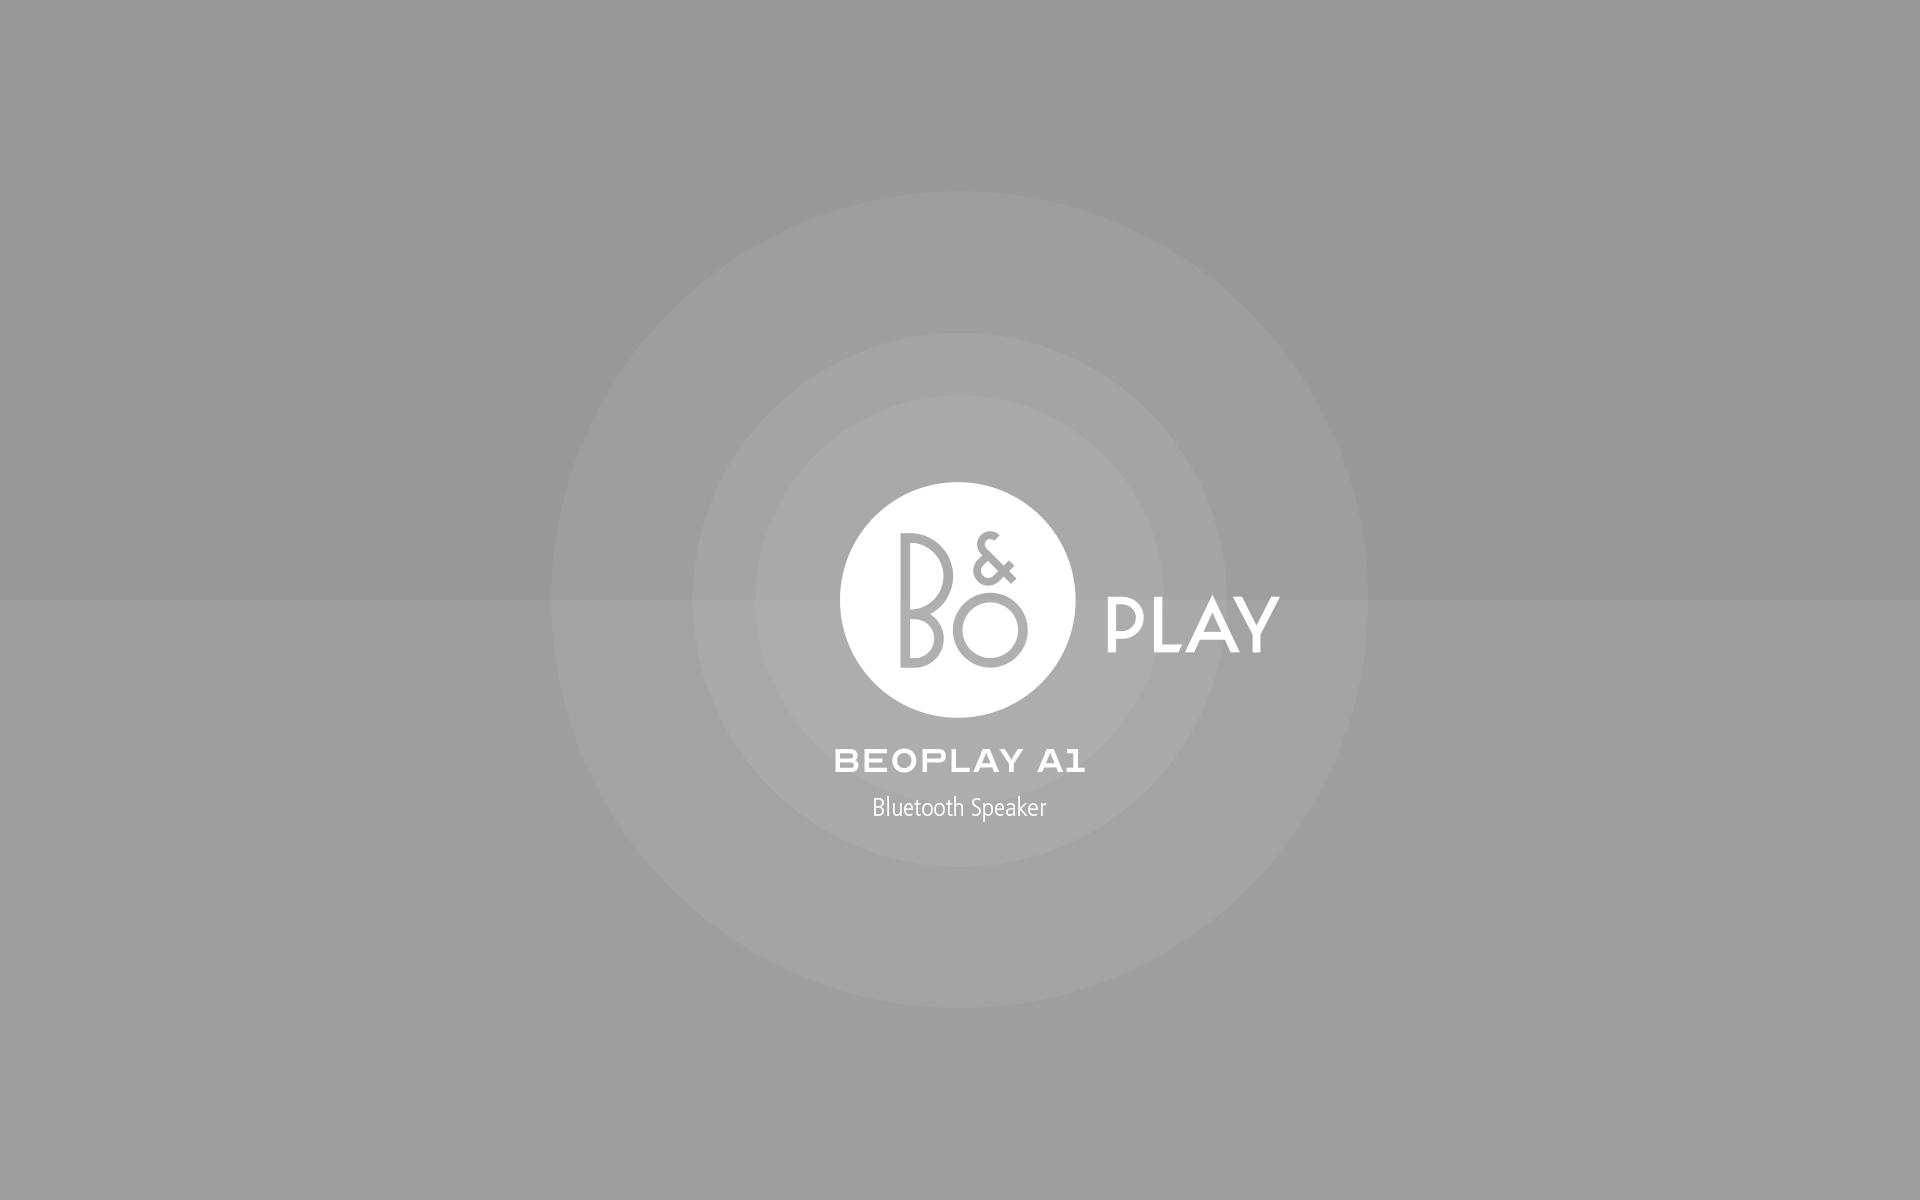 B&O Beoplay A1 Bluetoothスピーカーのレビュー (8ヶ月経過)